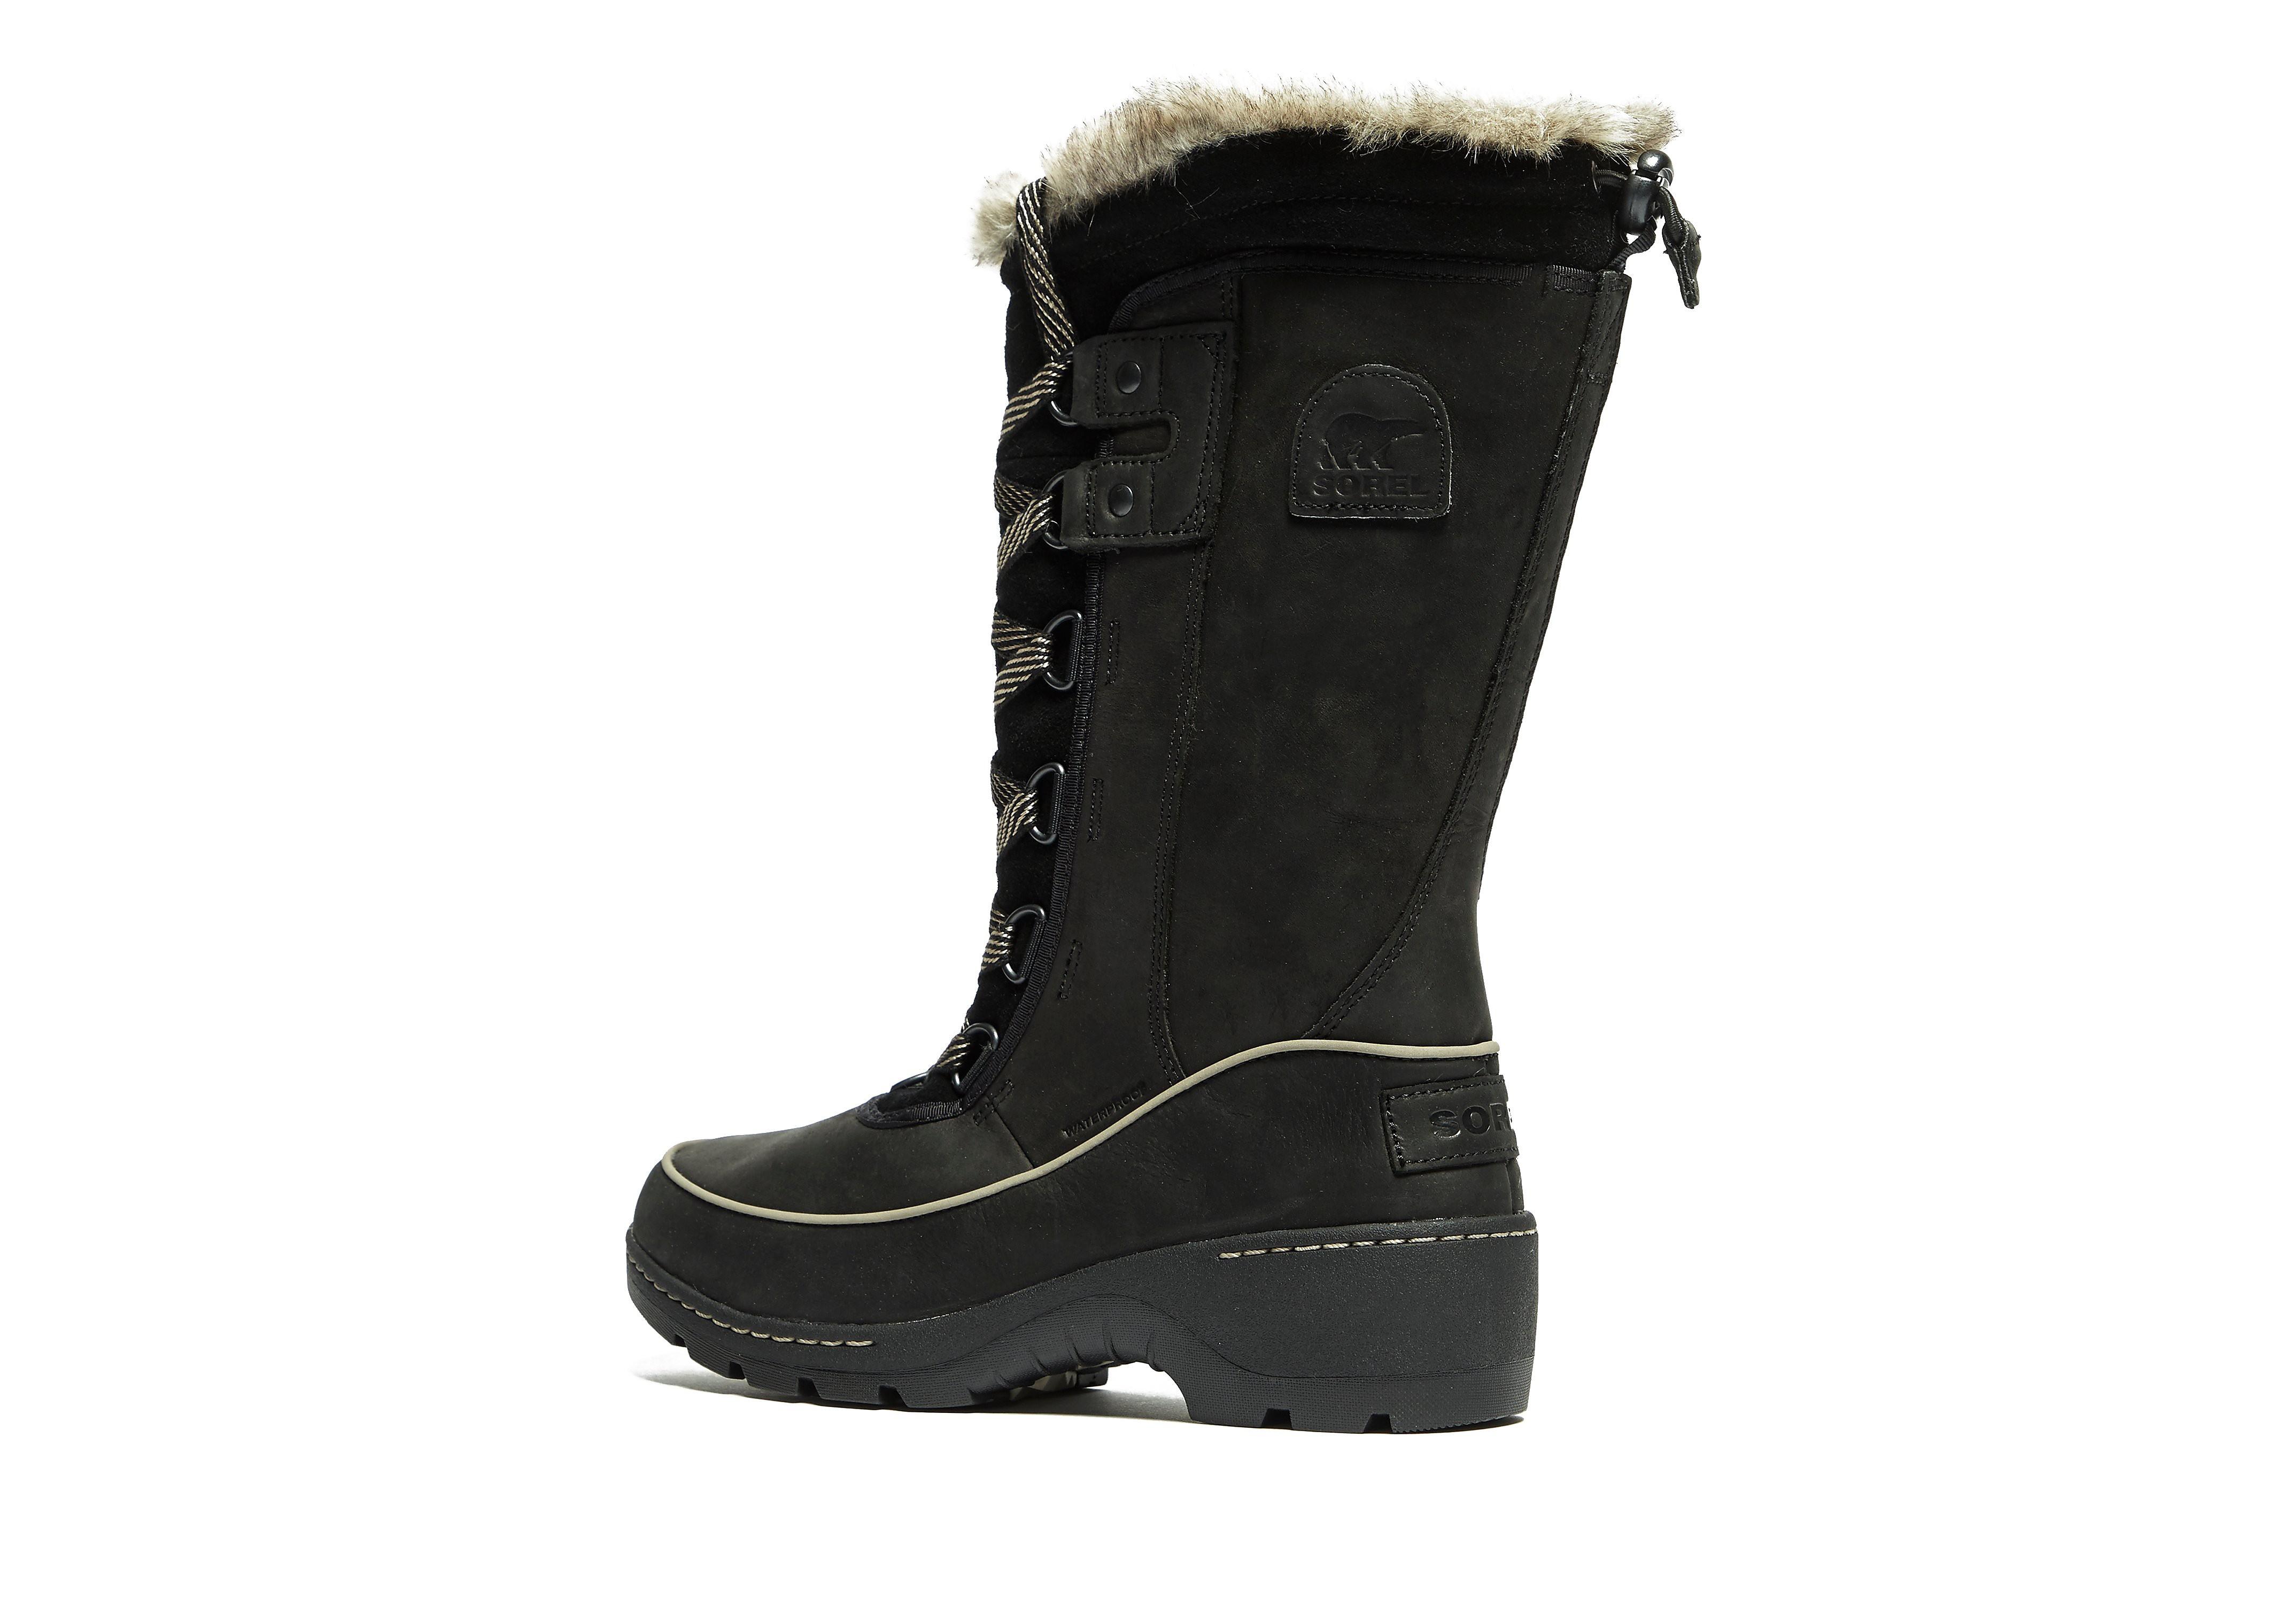 Sorel Torino High Premium Snow Boot Women's